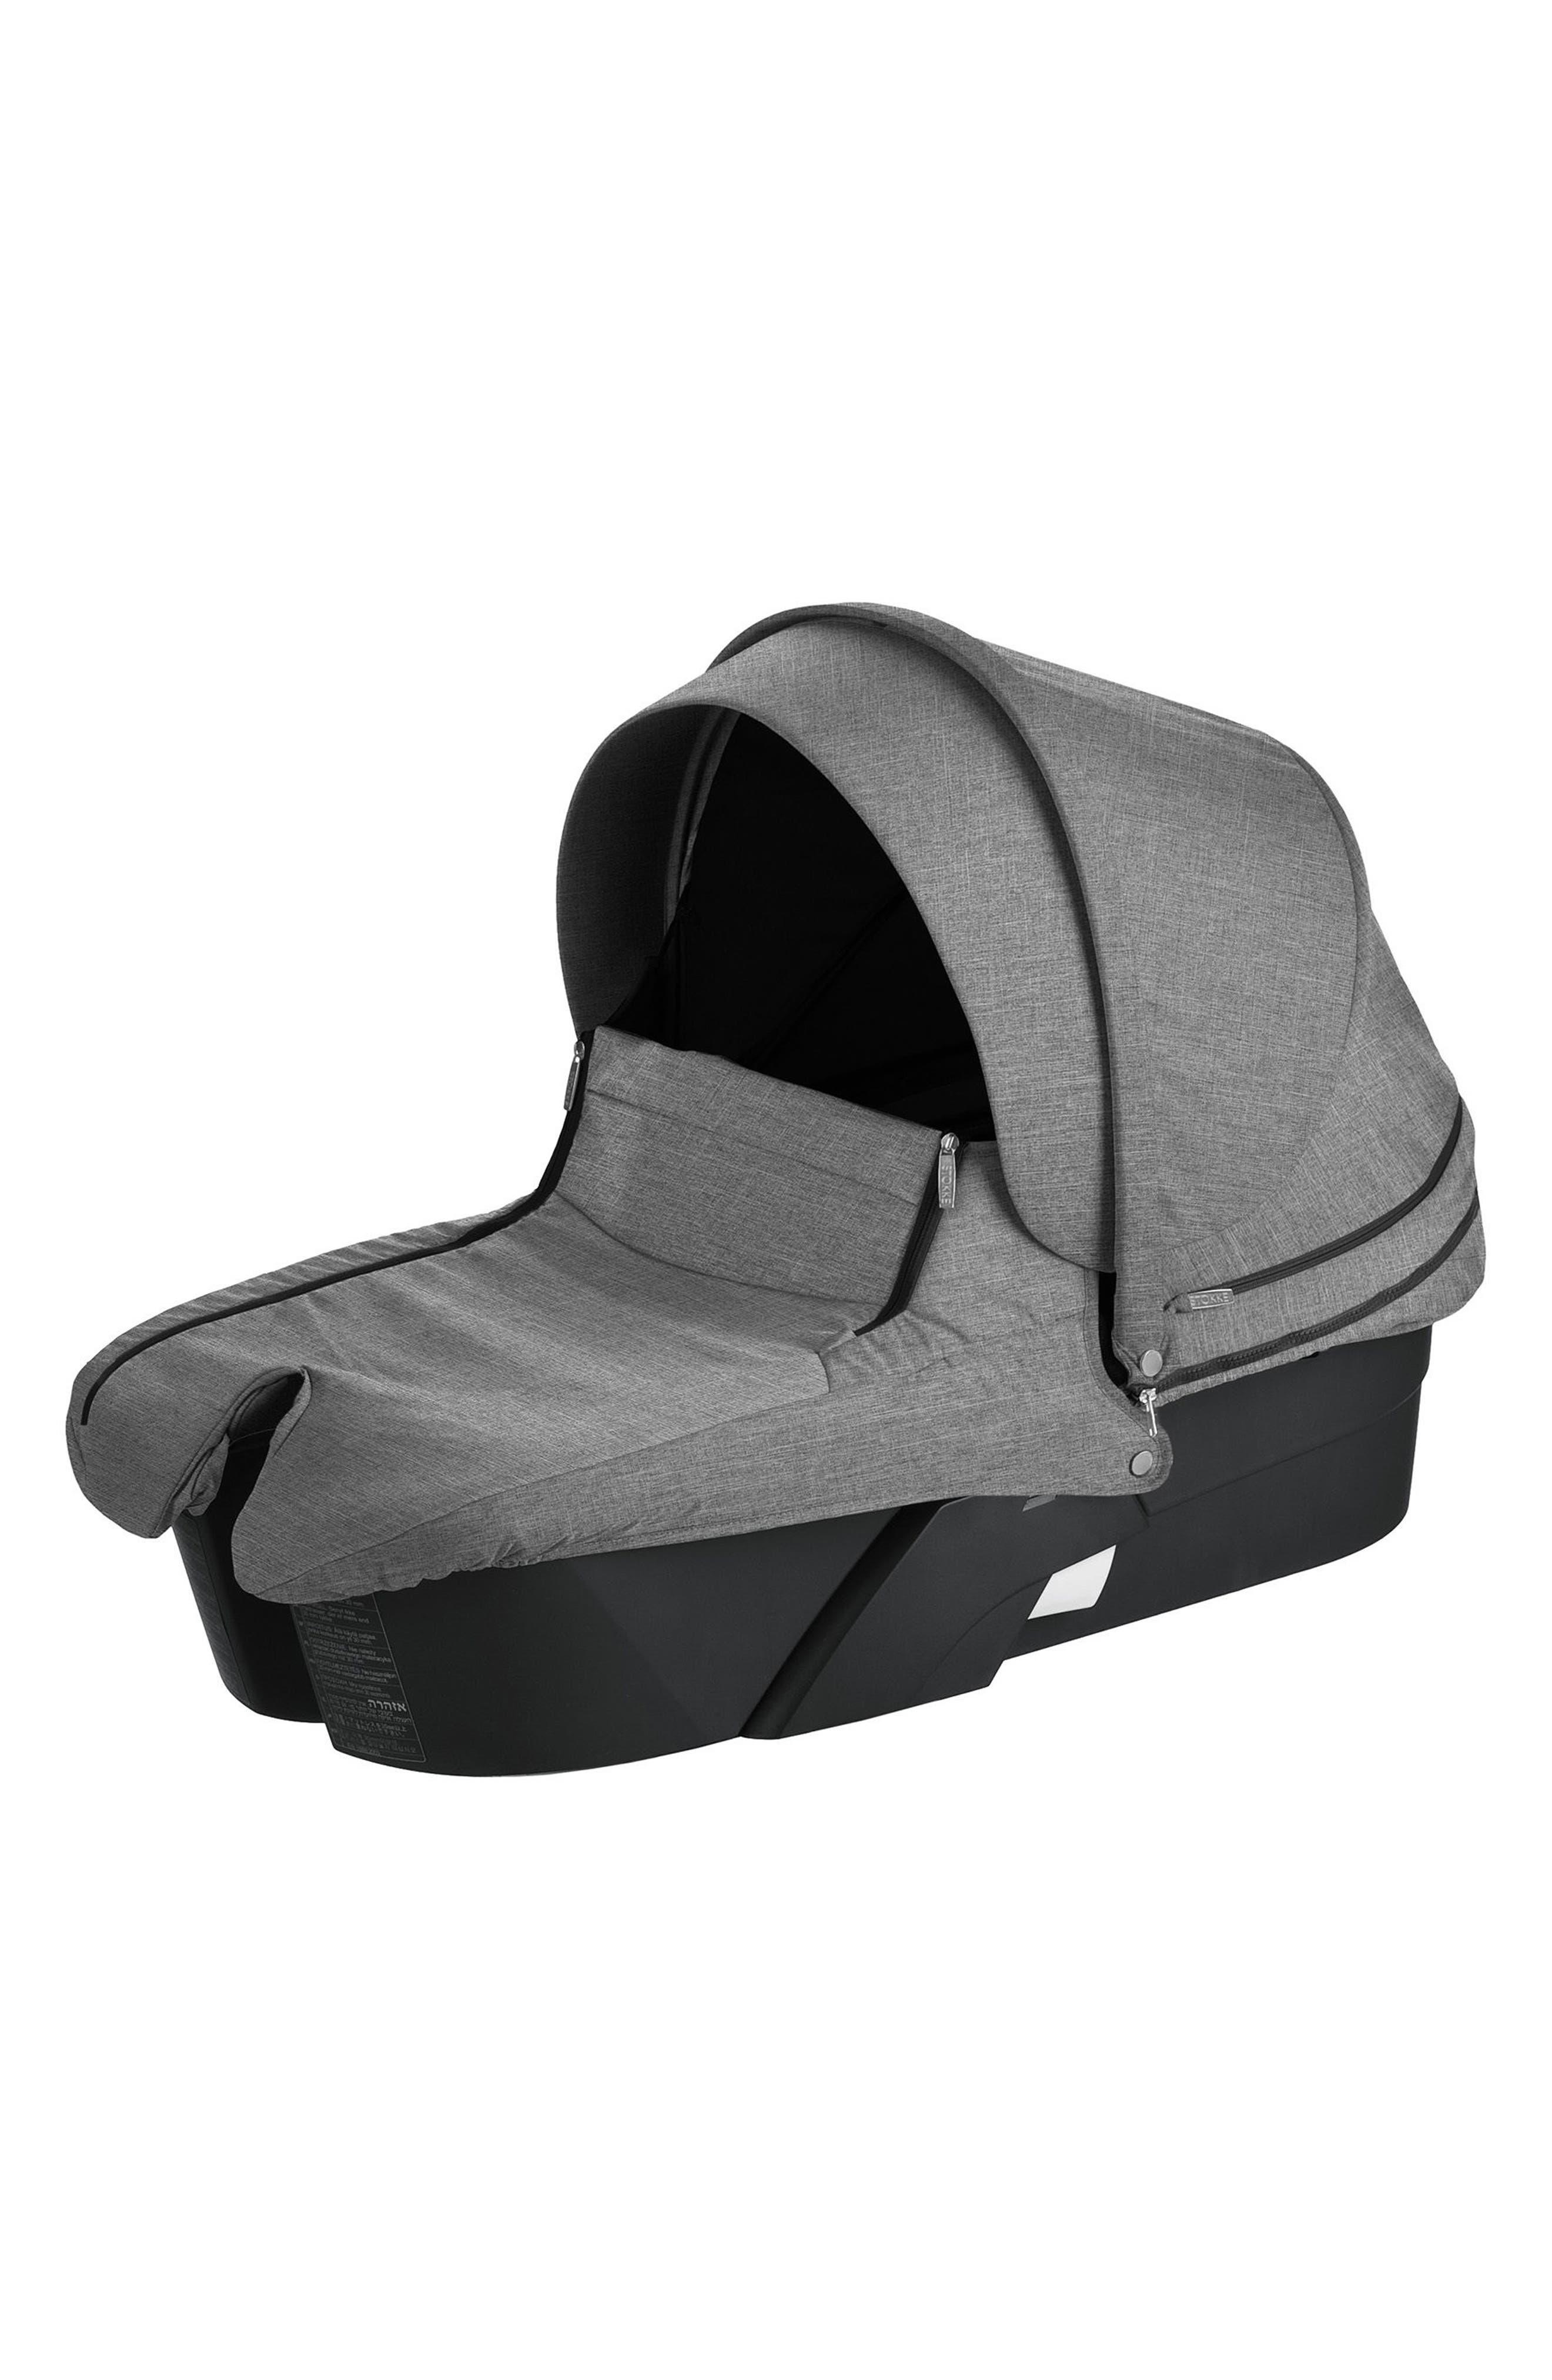 STOKKE,                             Xplory<sup>®</sup> Black Frame Stroller Carry Cot,                             Main thumbnail 1, color,                             001